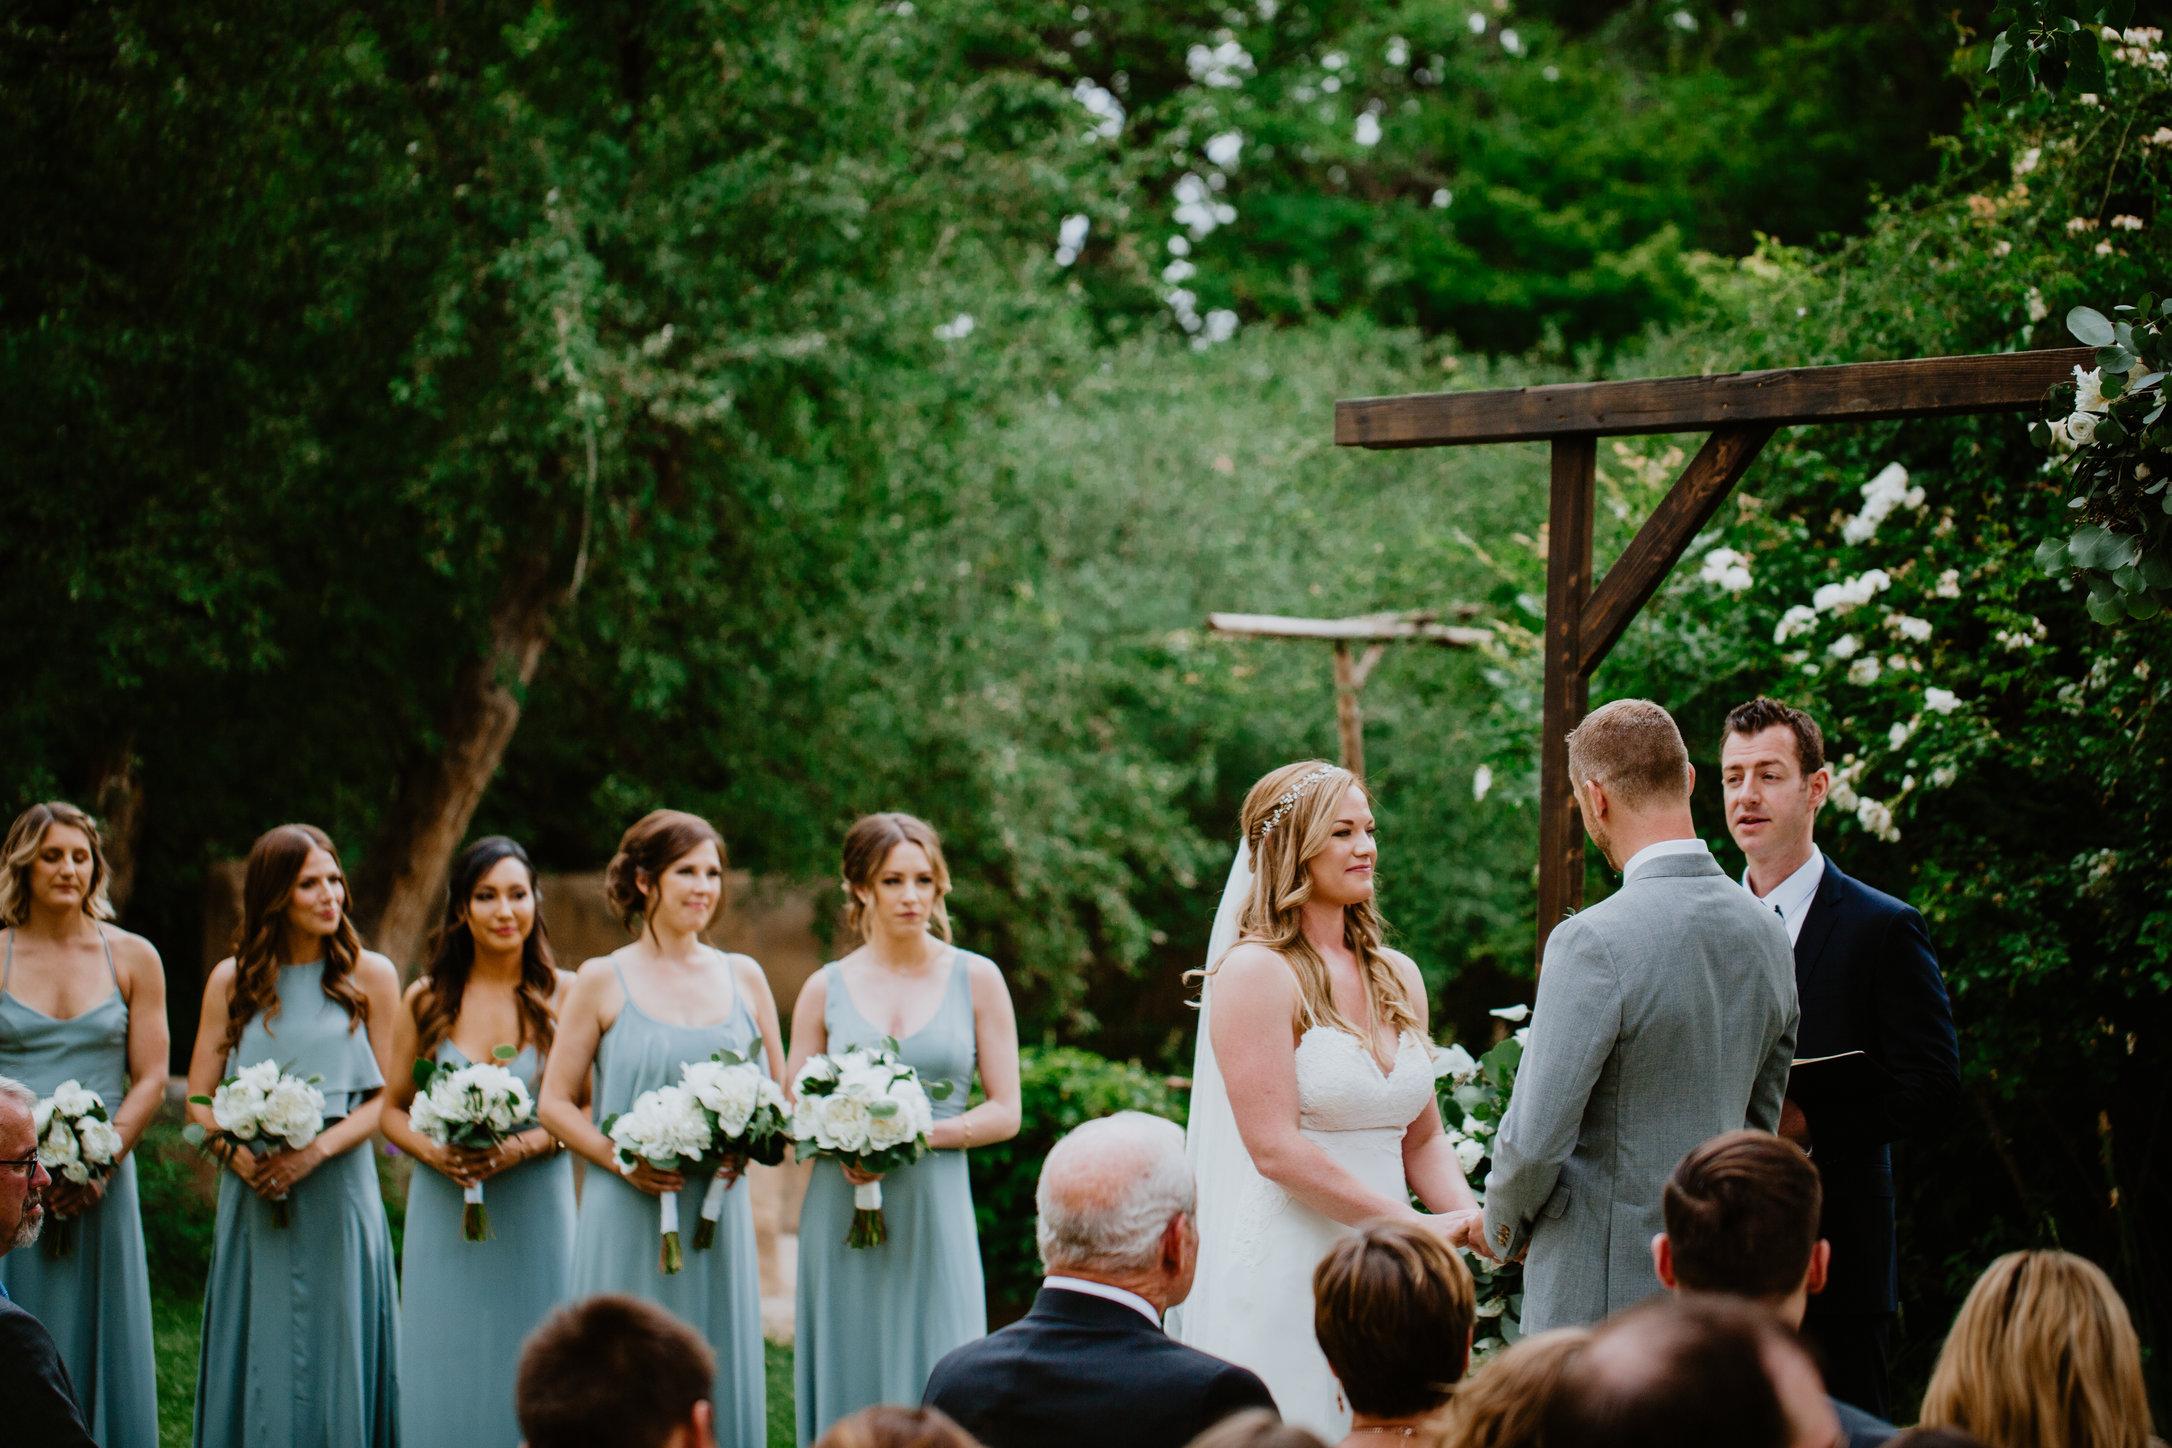 DandA-wedding-239.jpg